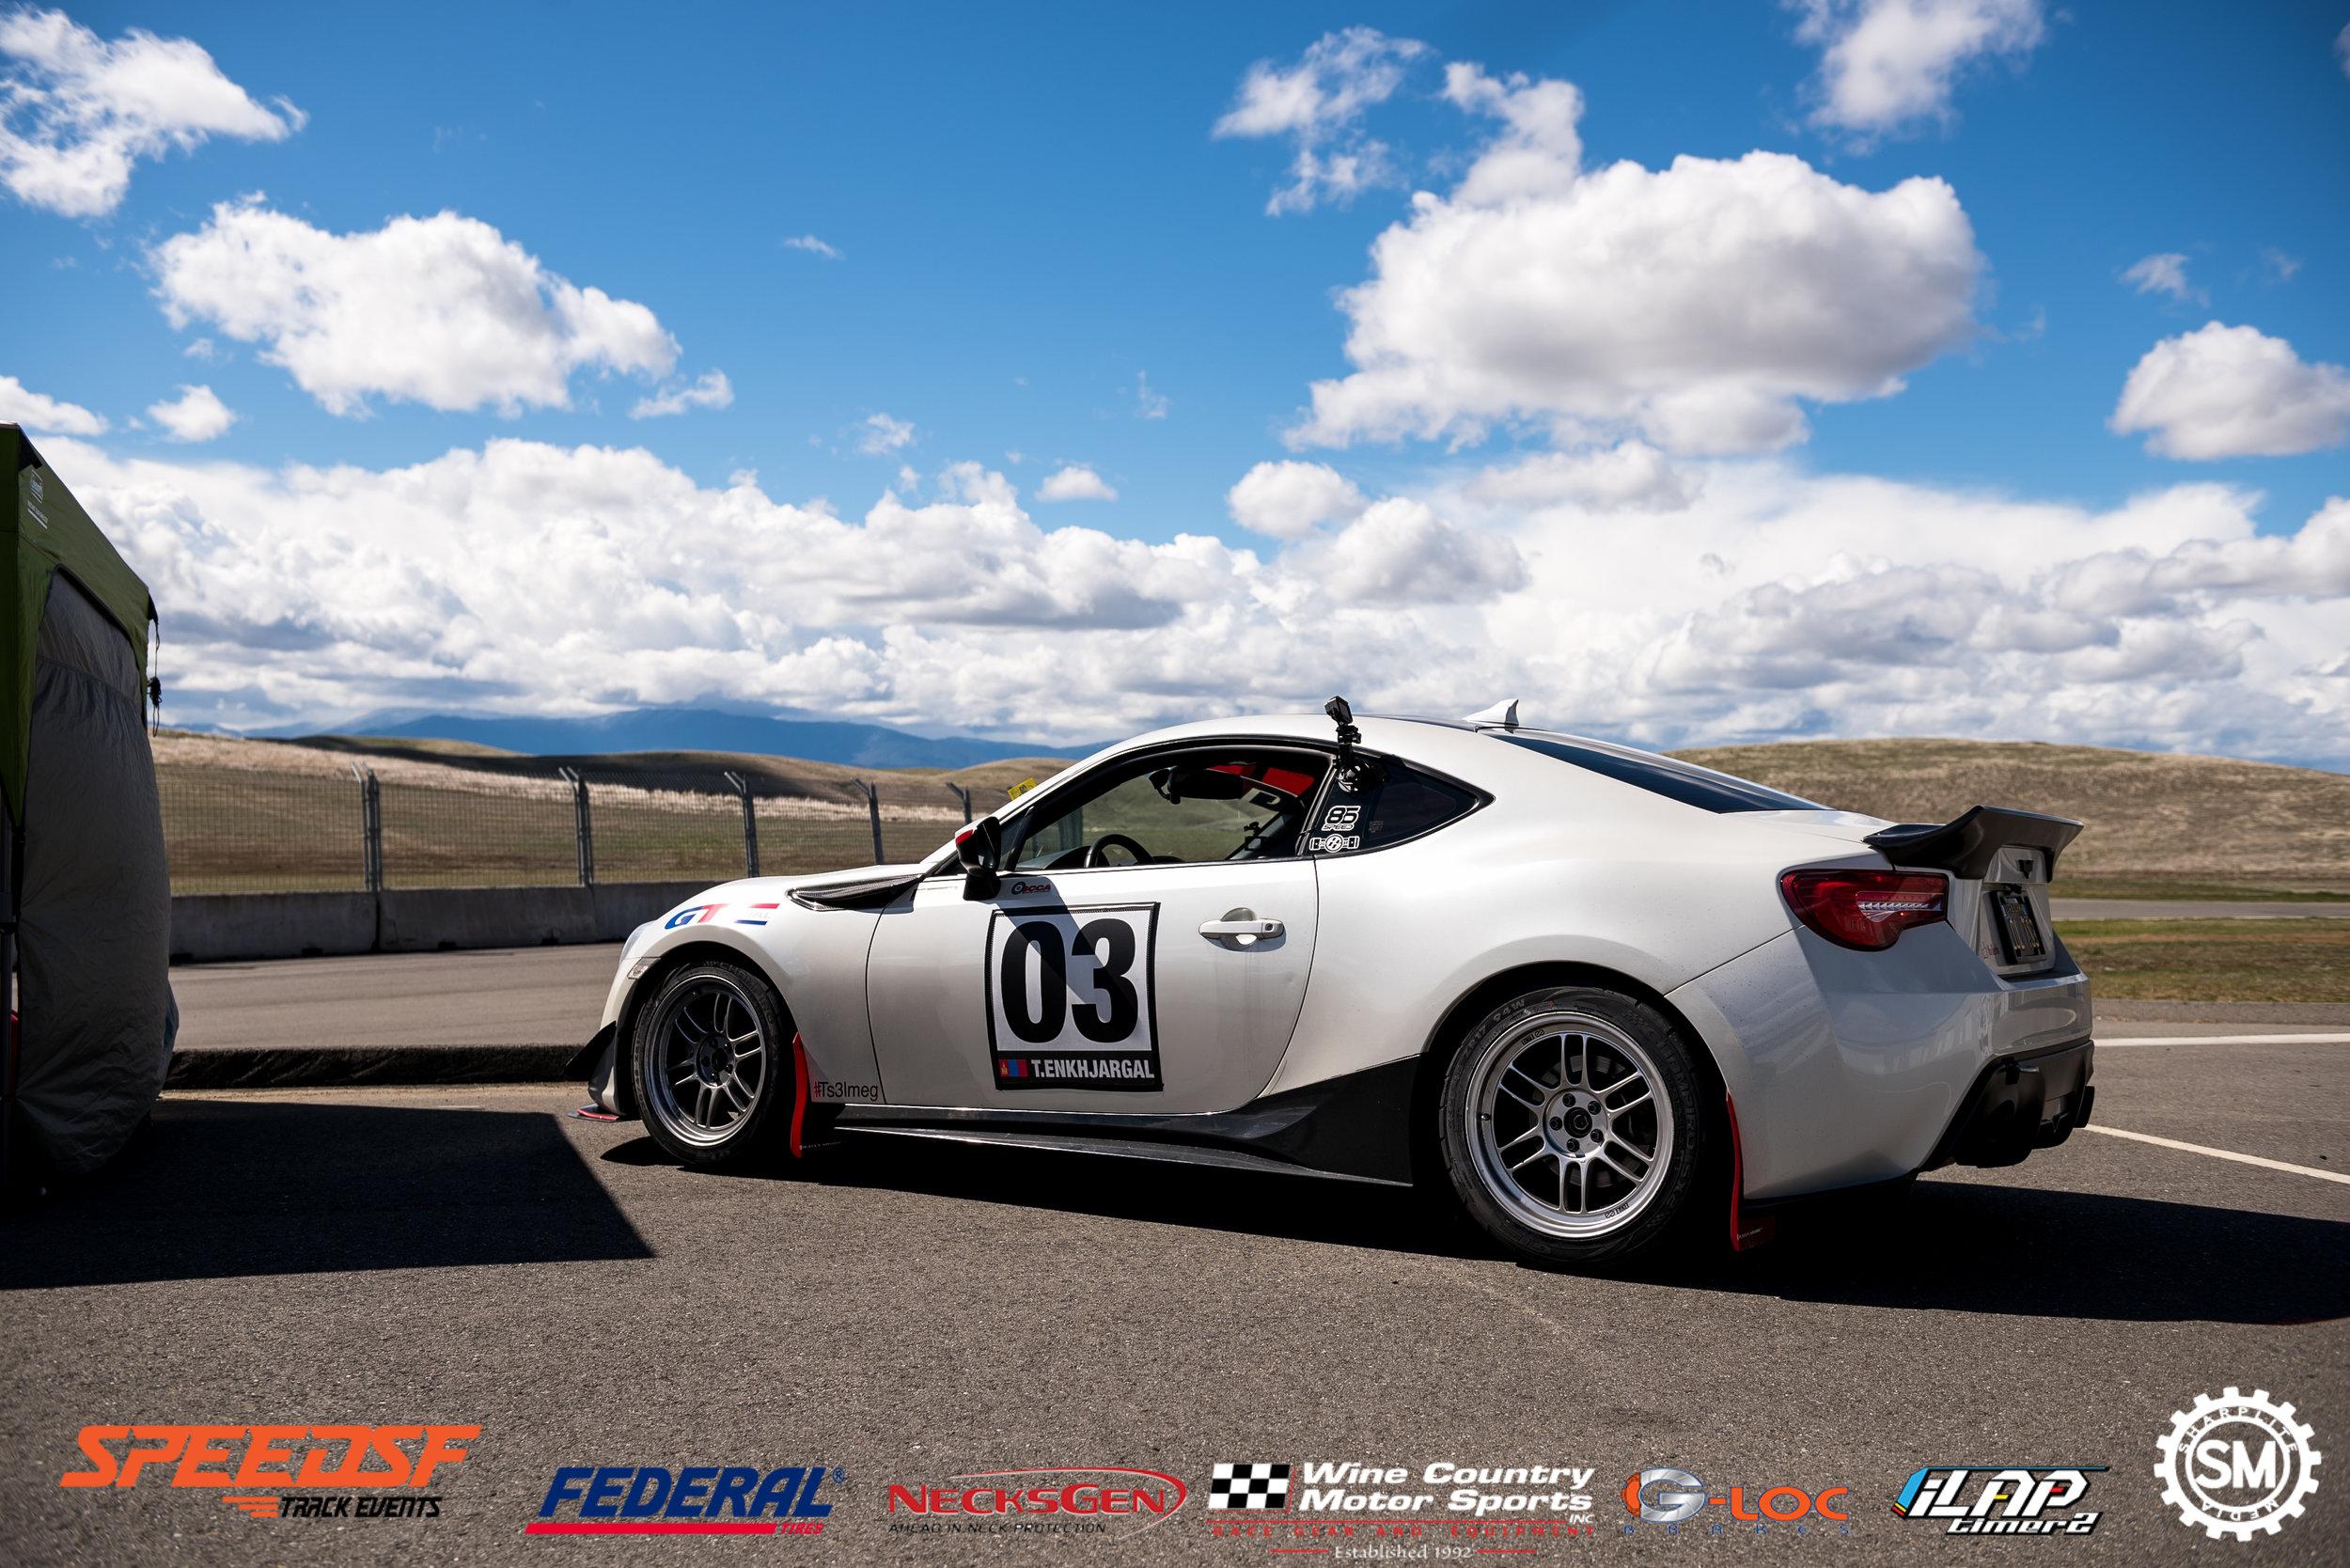 SpeedSF Paddock-77.jpg